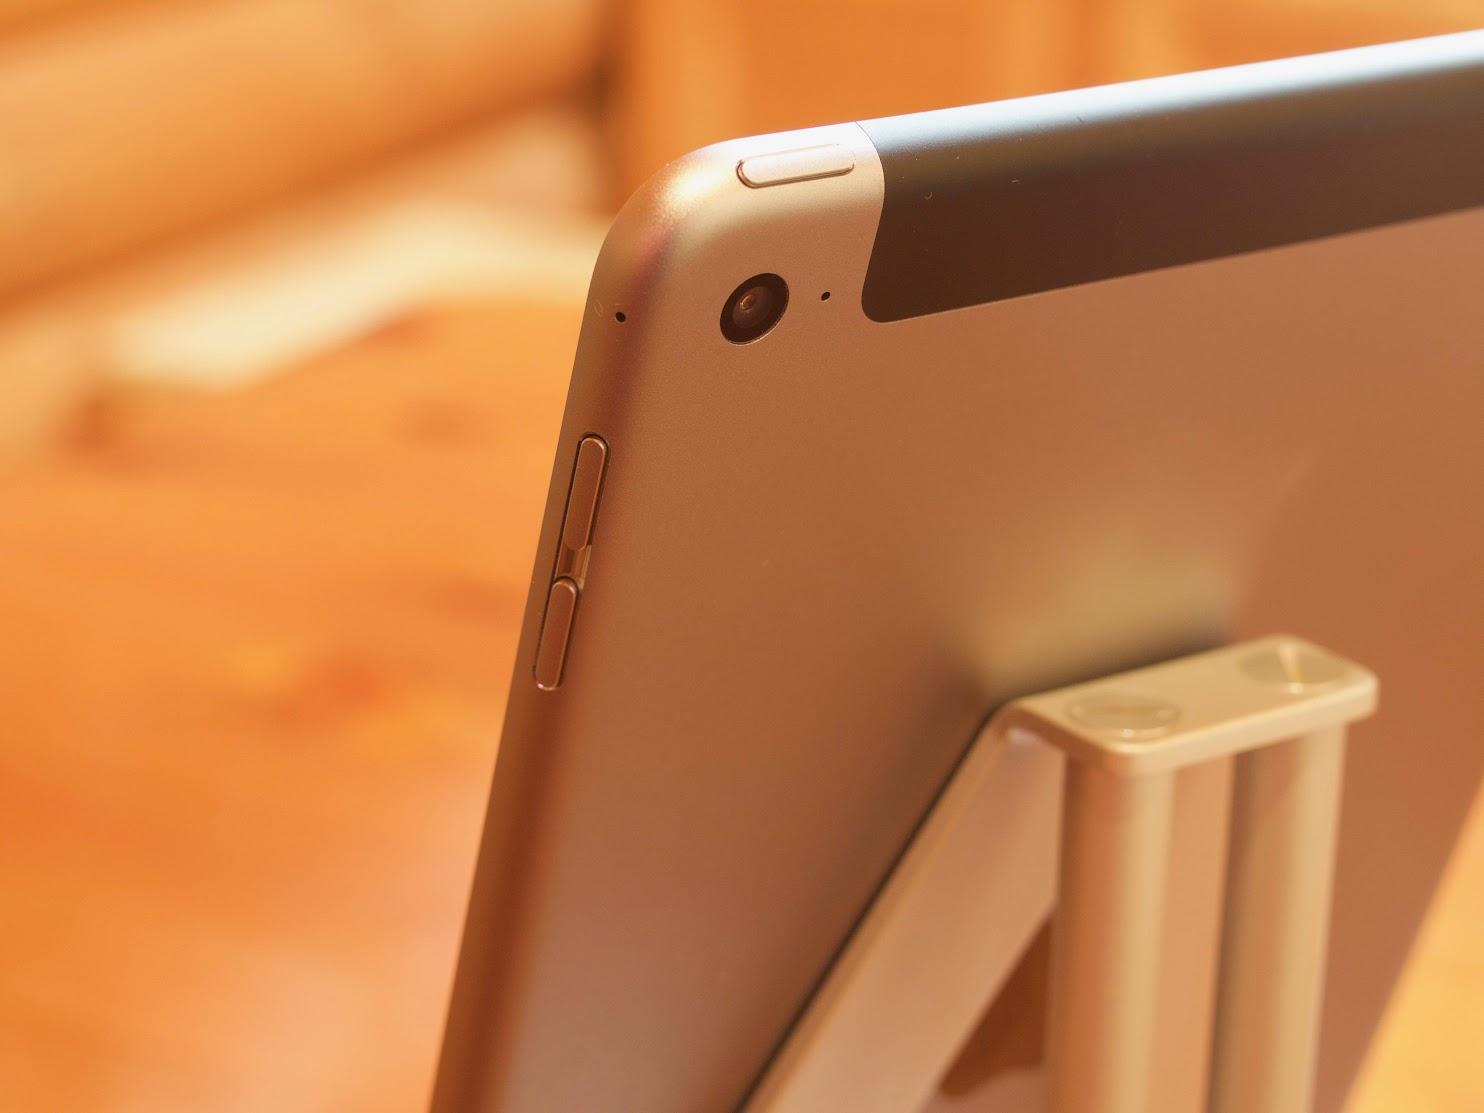 iPad mini 4 Wi-Fi + Cellular